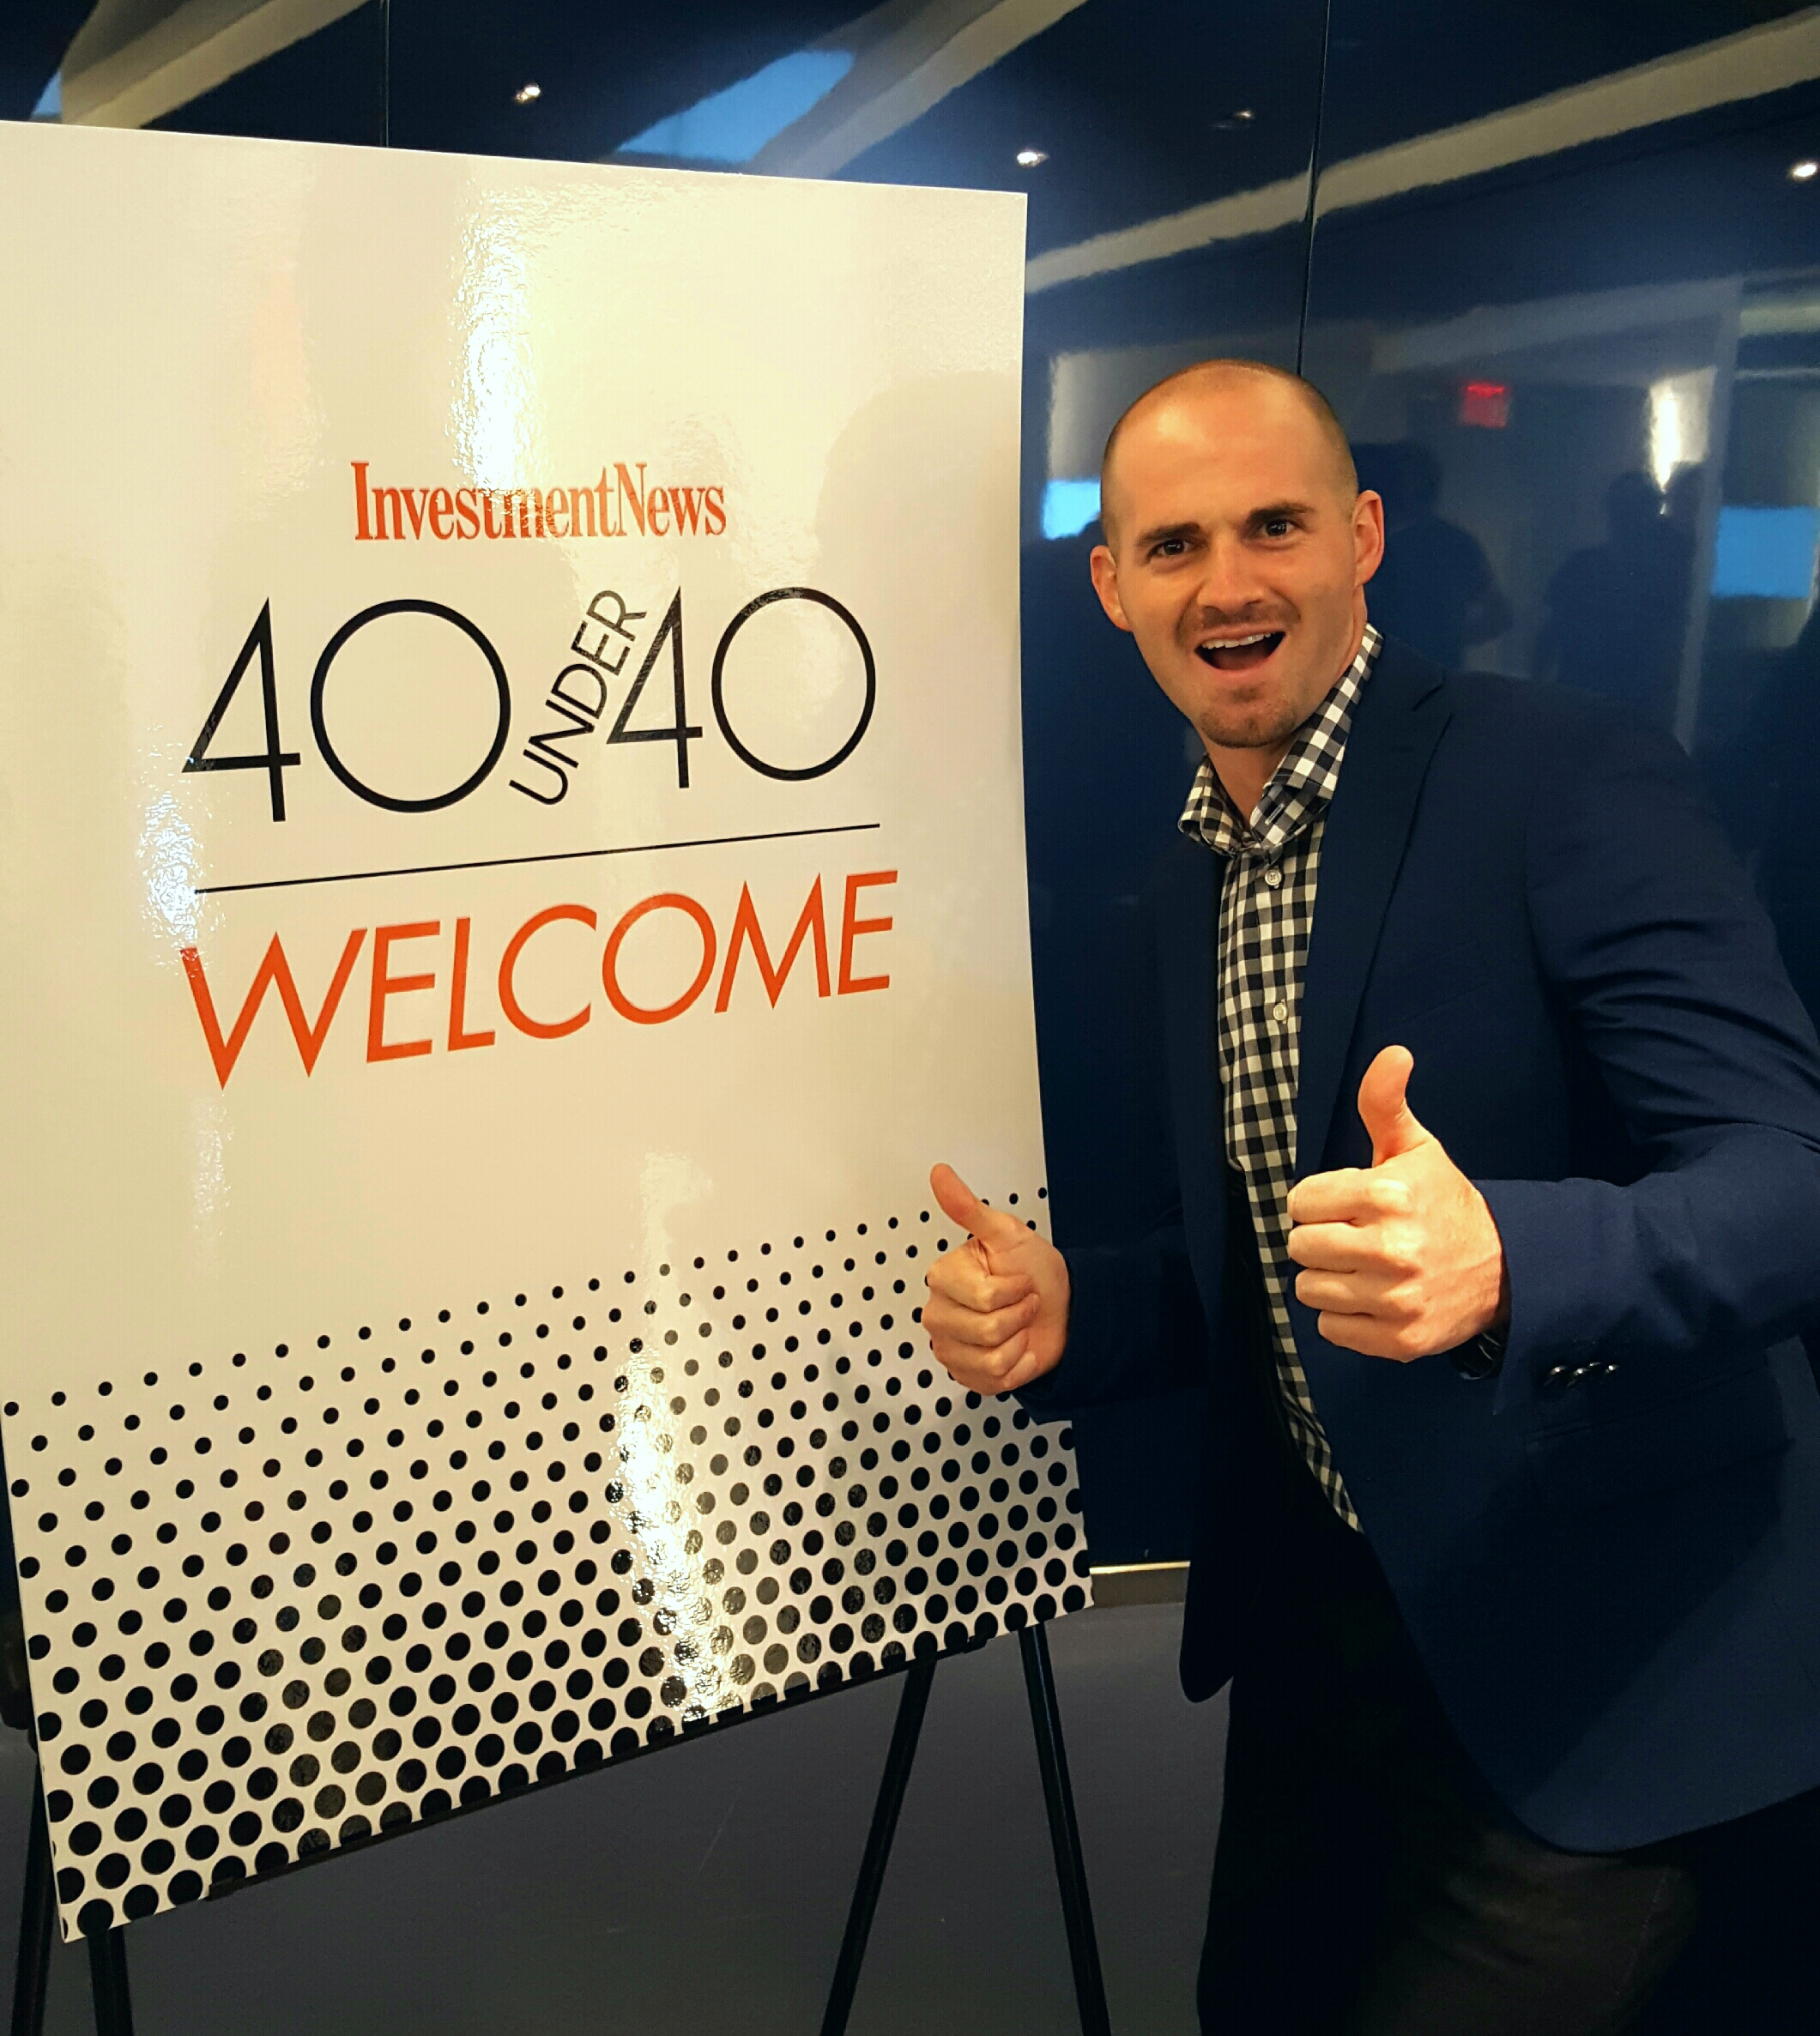 40 under 40 welcome sign.jpg